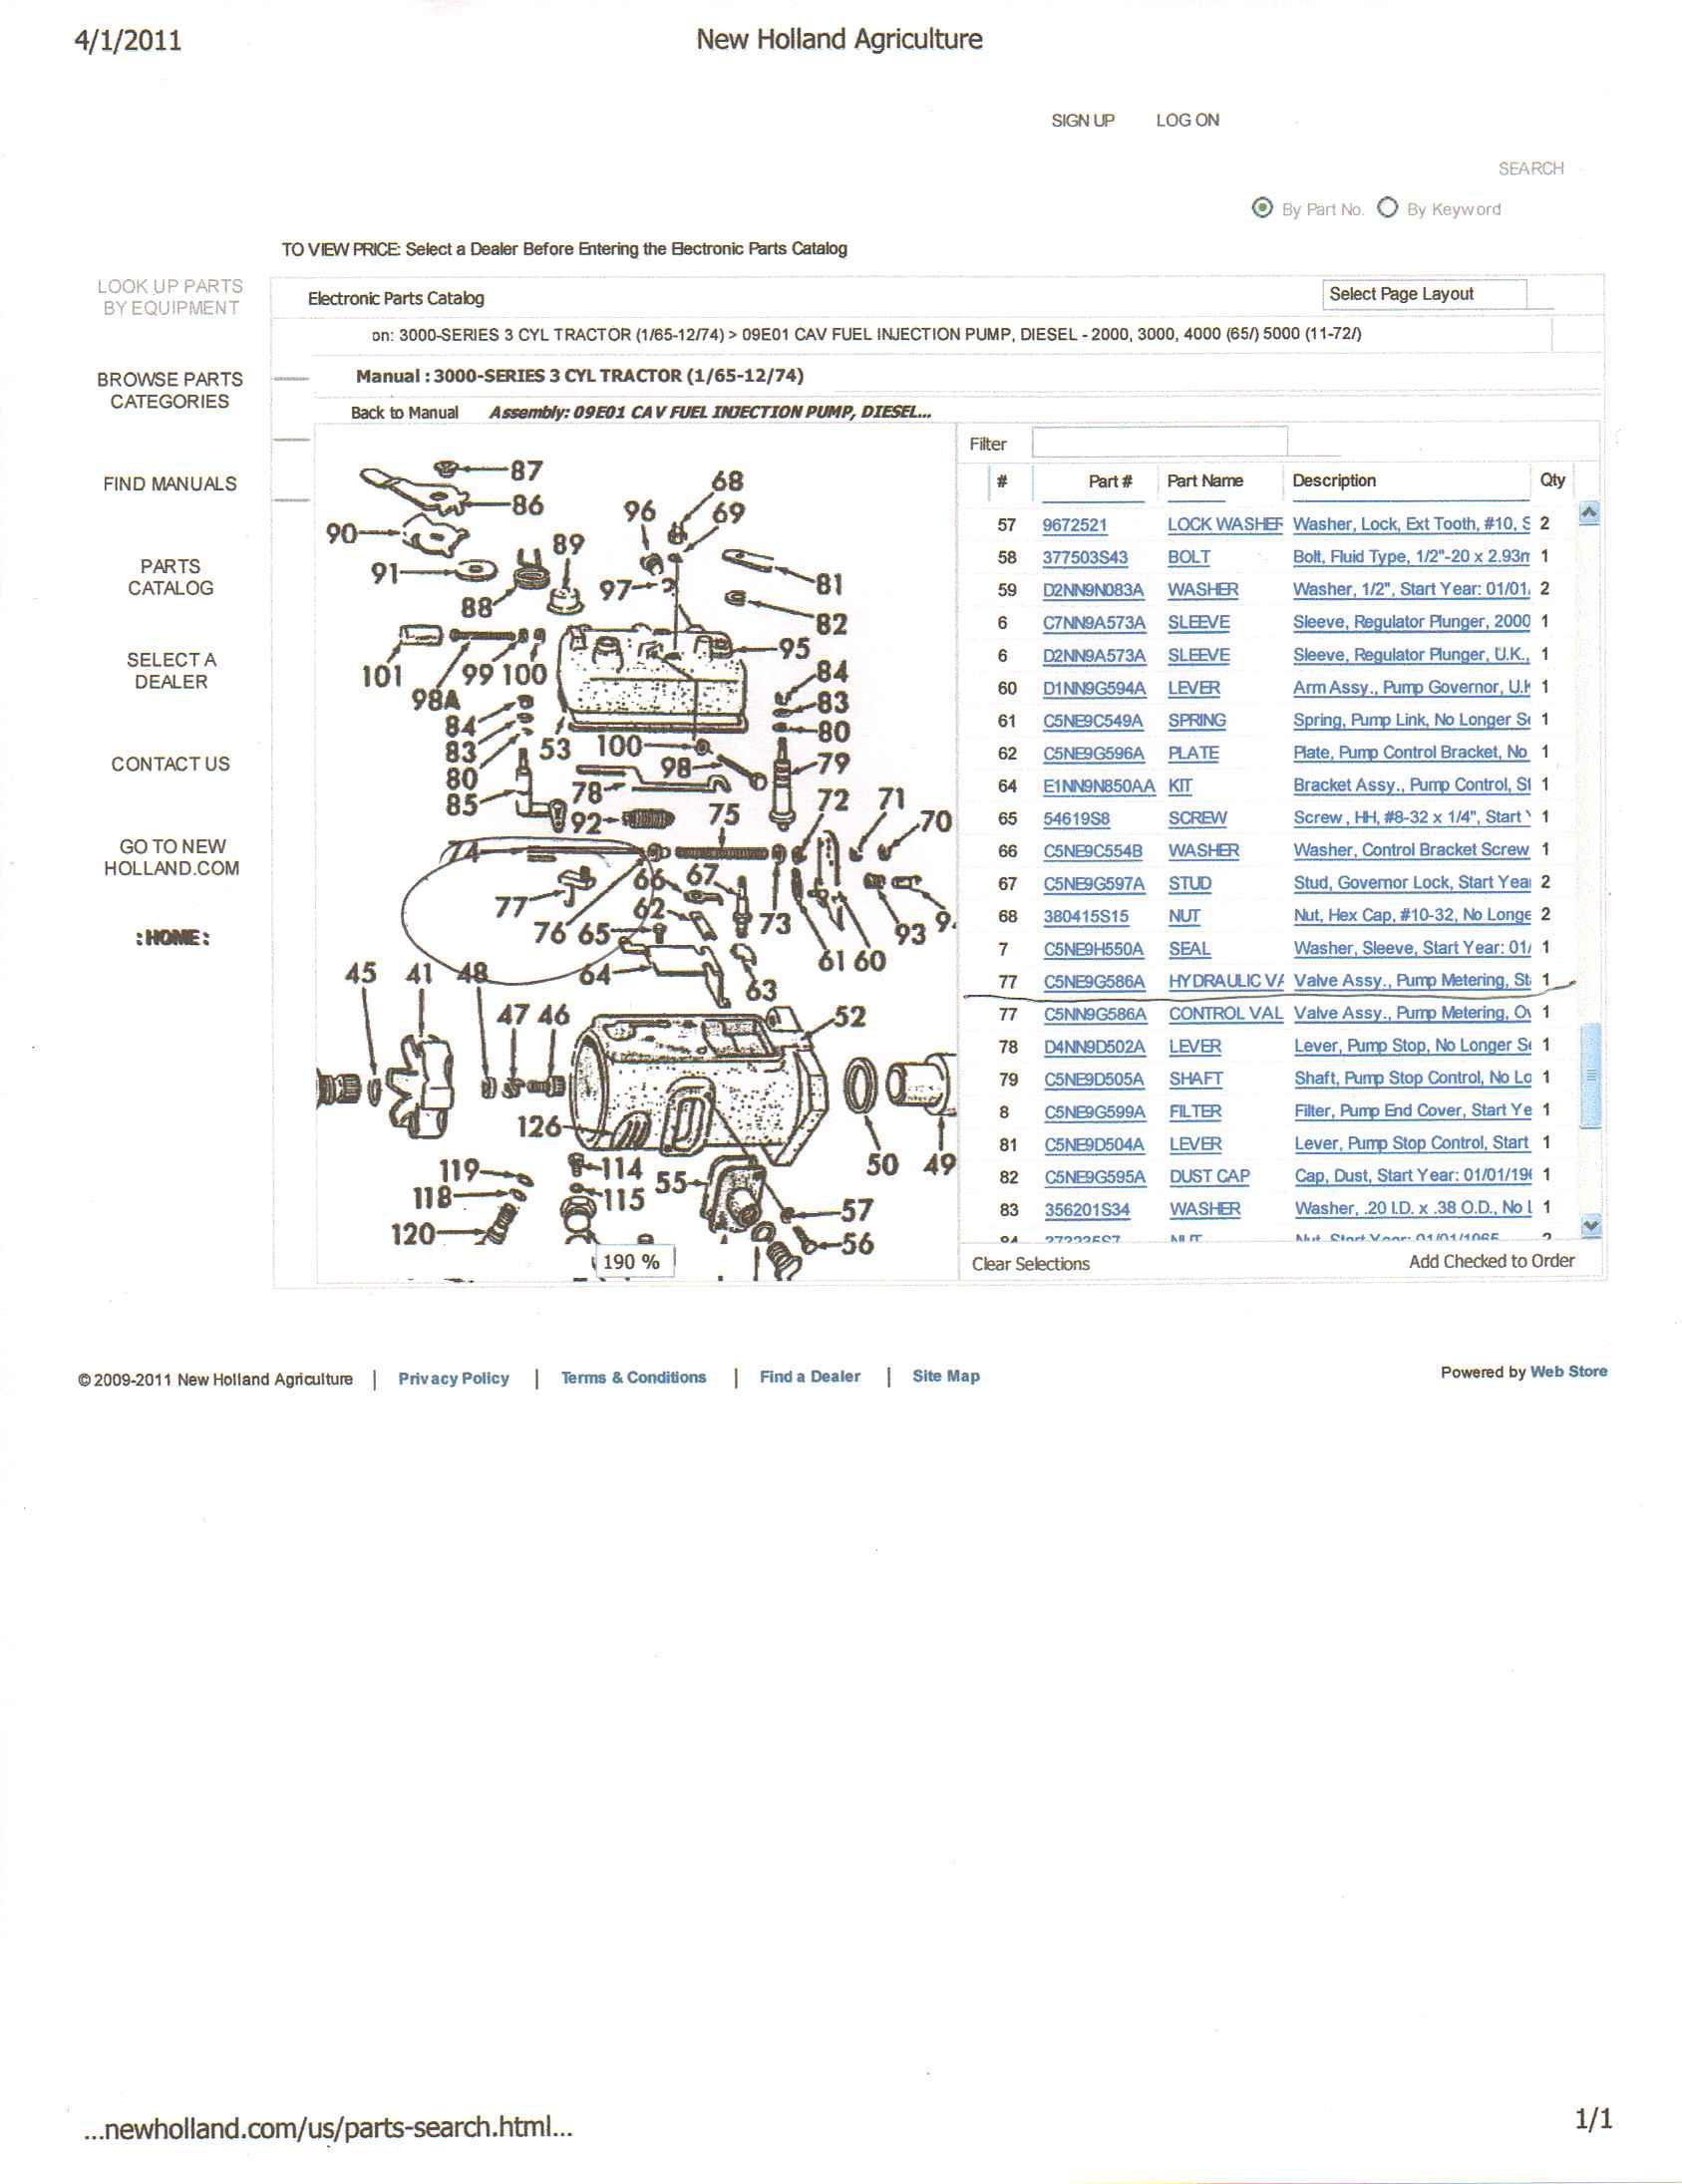 mf 165 wiring diagram Wiring Diagrams And Schematics – Massey Ferguson 165 Wiring Diagram